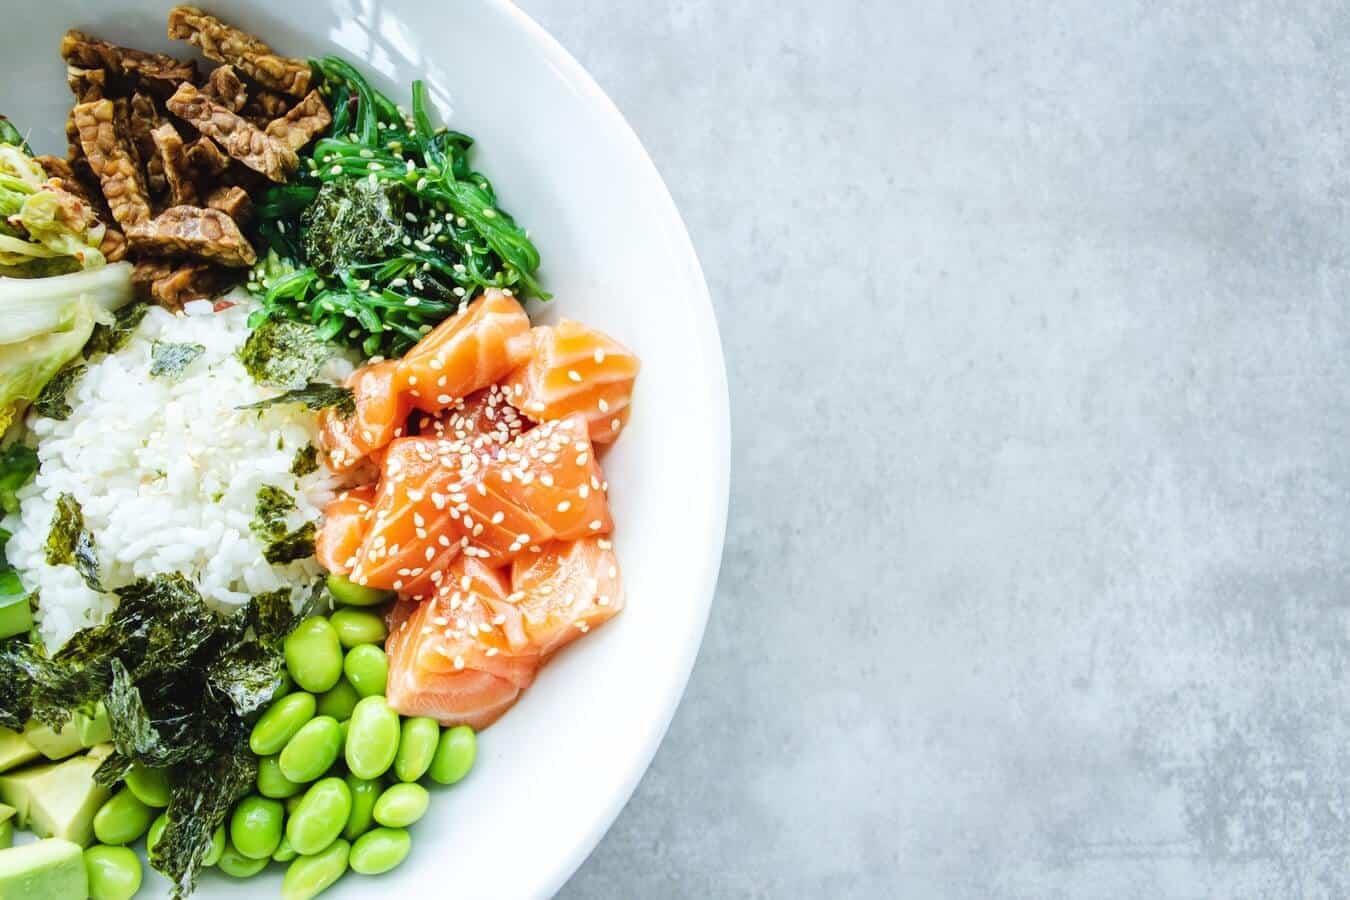 Best Low-Calorie Cookbook Apps